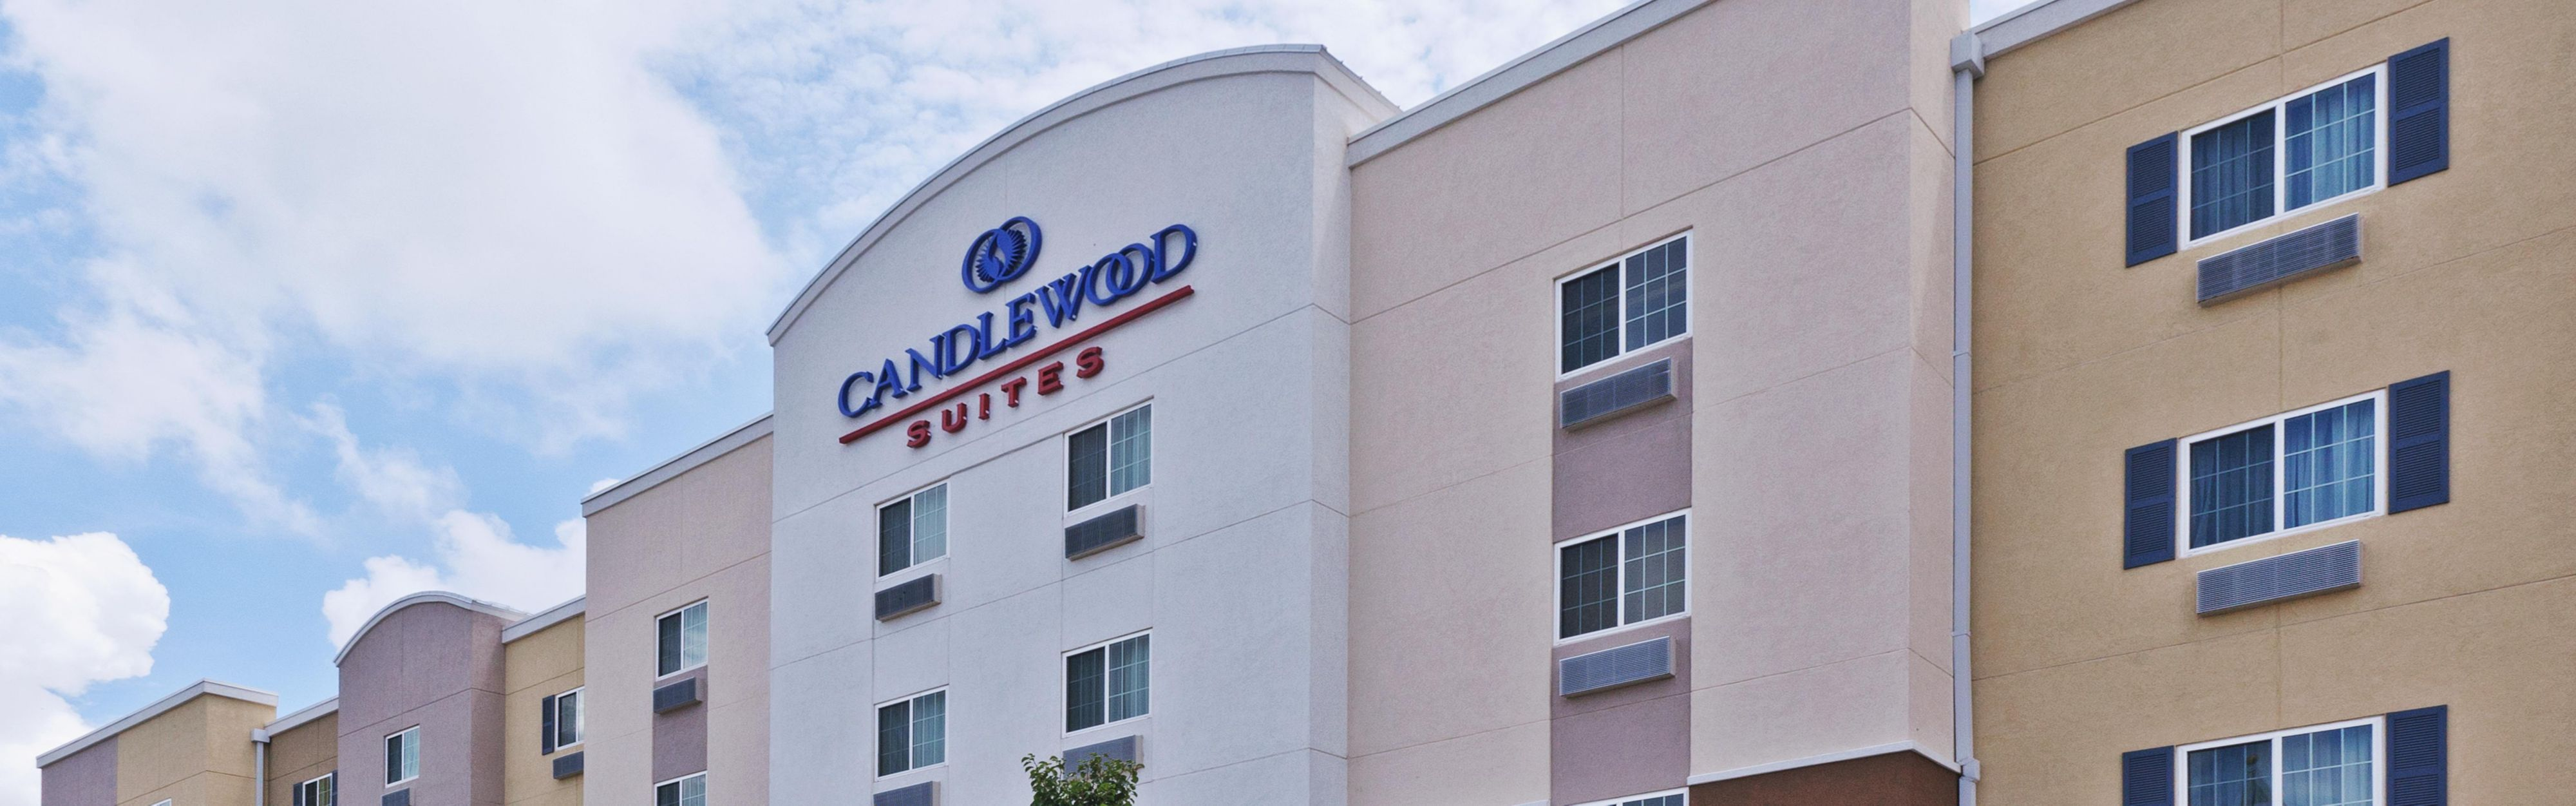 Candlewood Suites Bartlesville East image 0